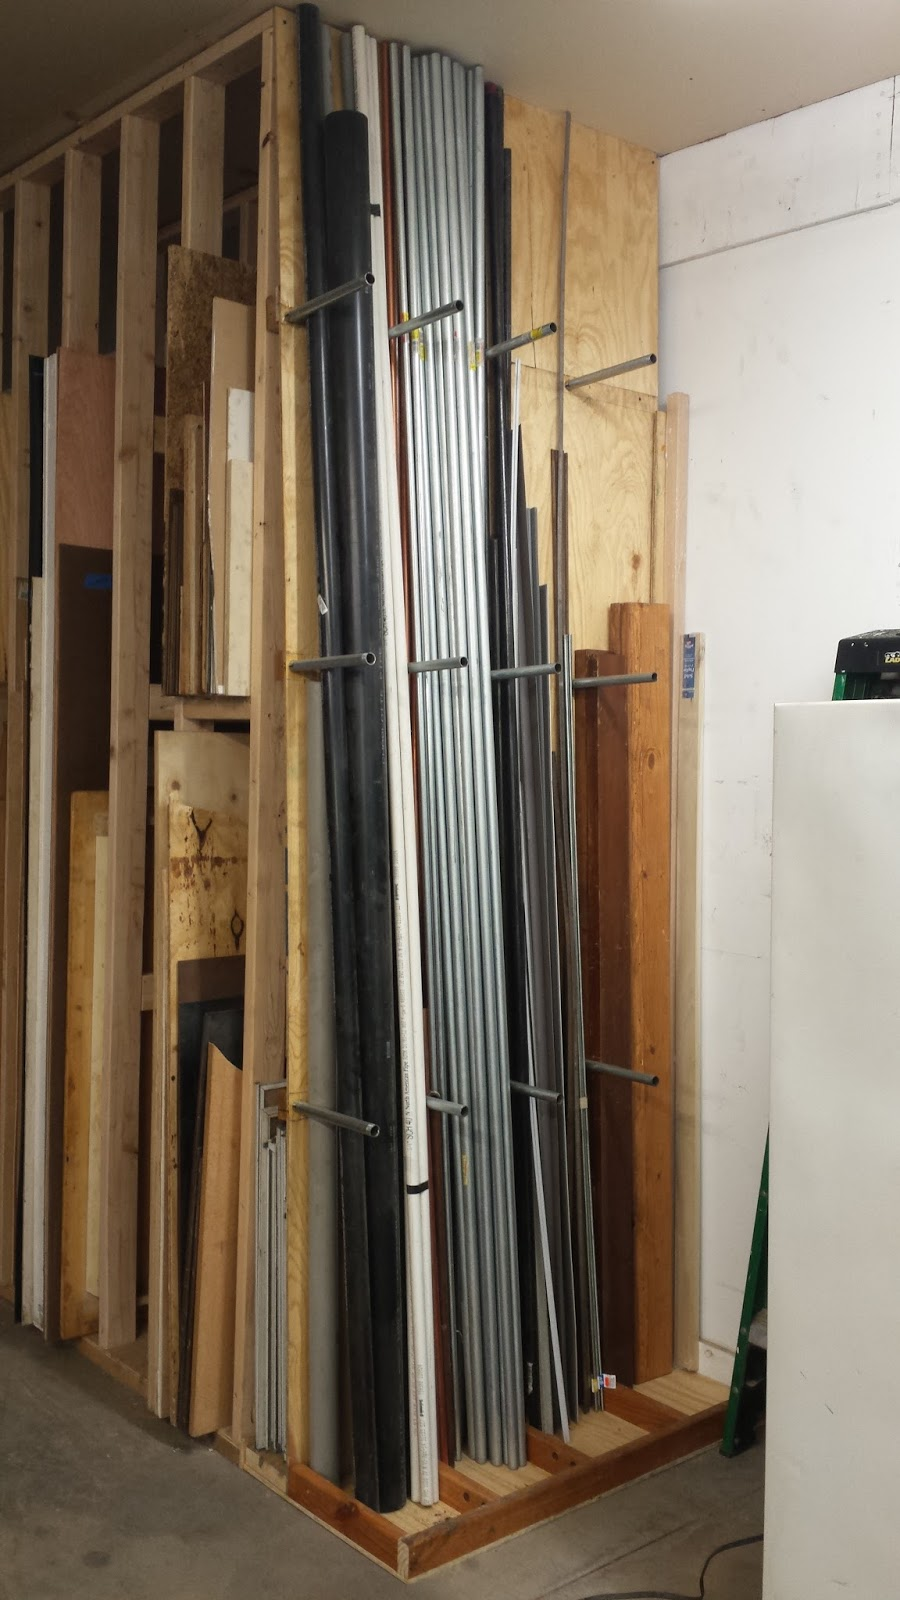 Mrx designs vertical pipe storage rack for Vertical lumber storage rack